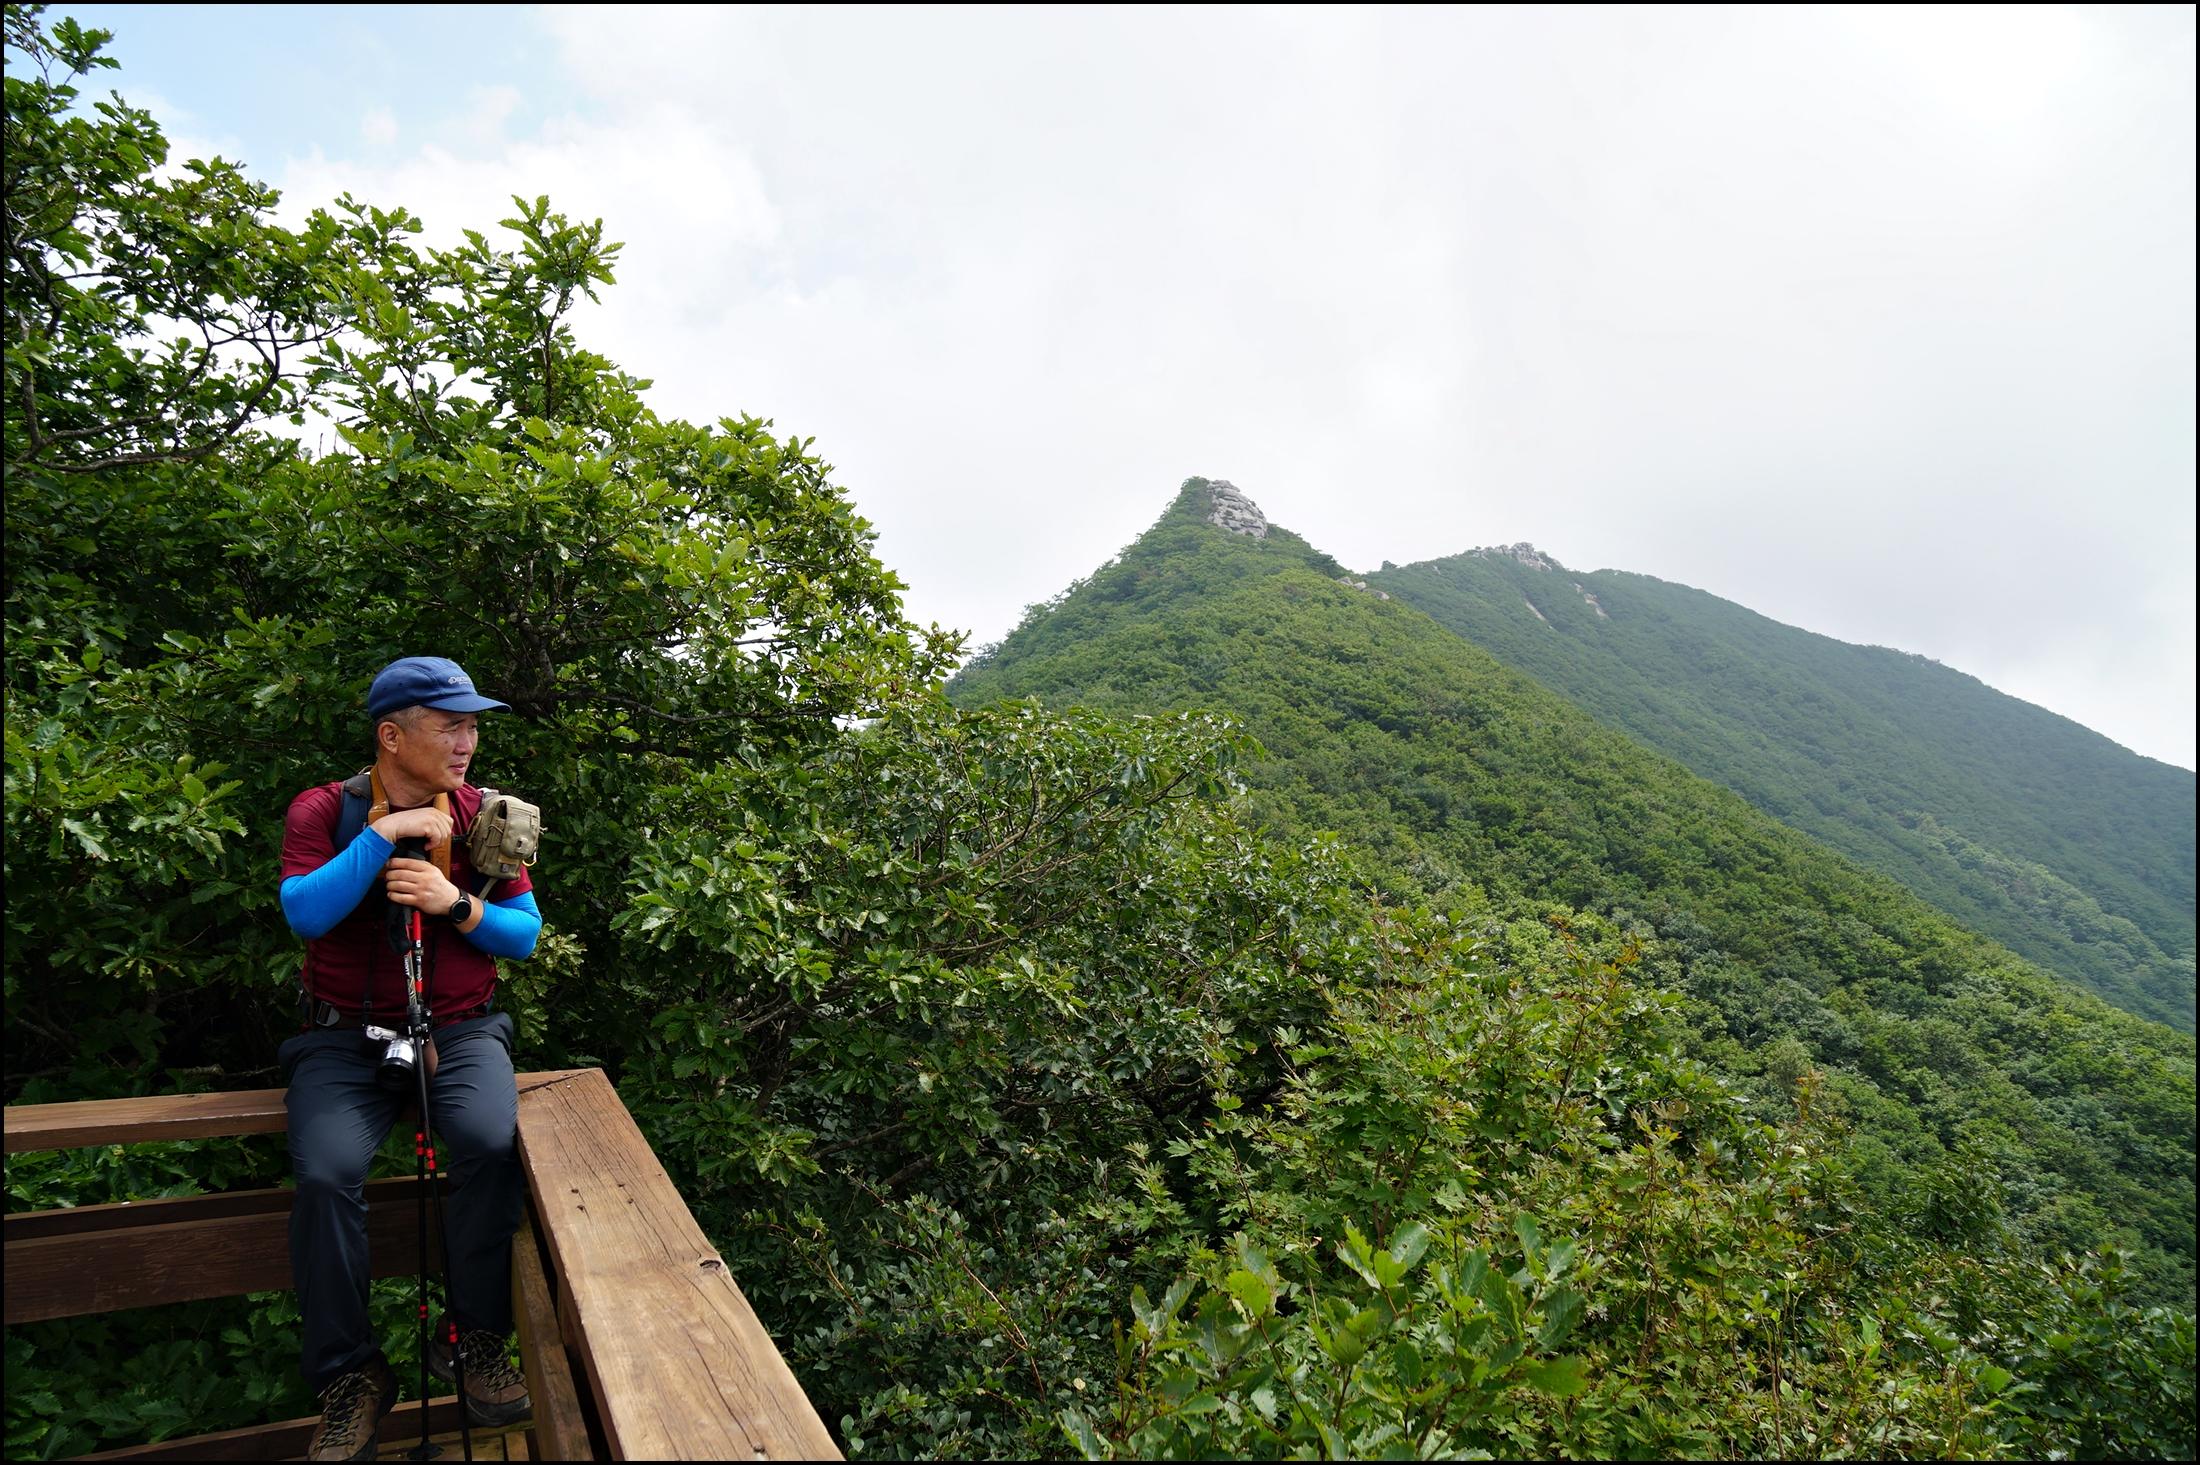 Kibaeksan and Yongchu Valley (2020.08.24)